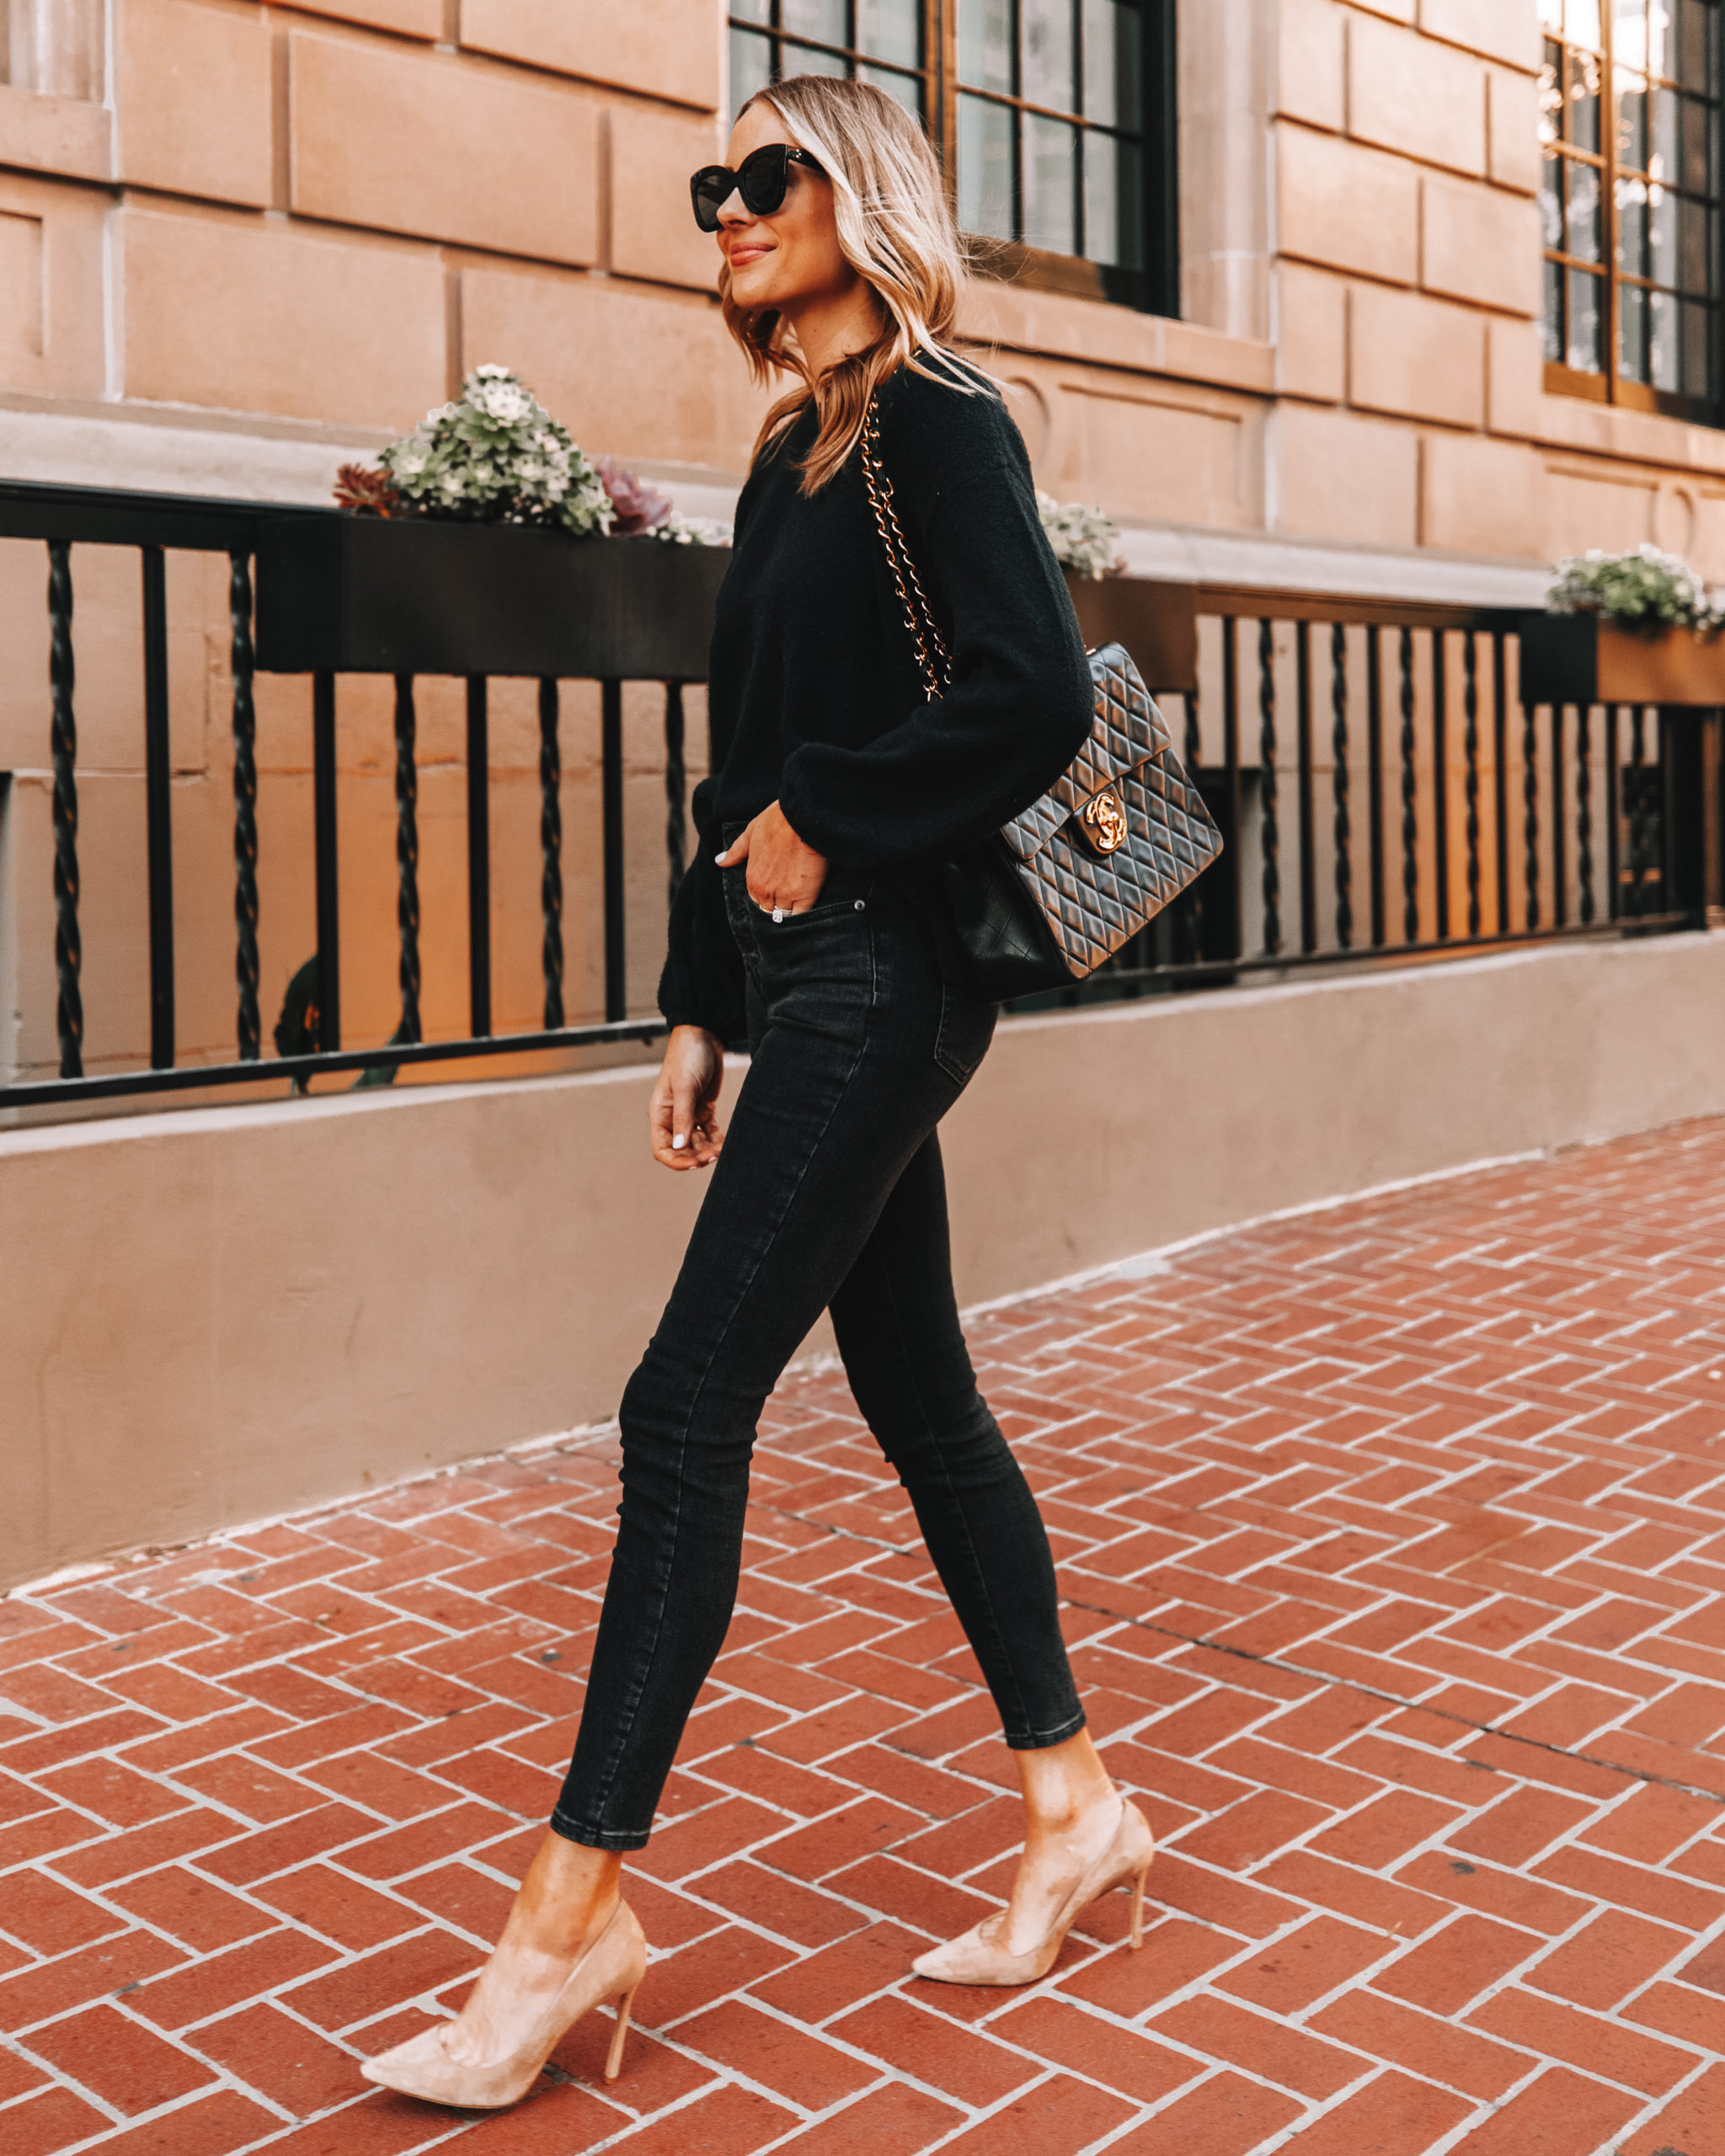 Fashion Jackson Wearing Black Sweater Black Skinny Jeans Nude Pumps Black Chanel Handbag